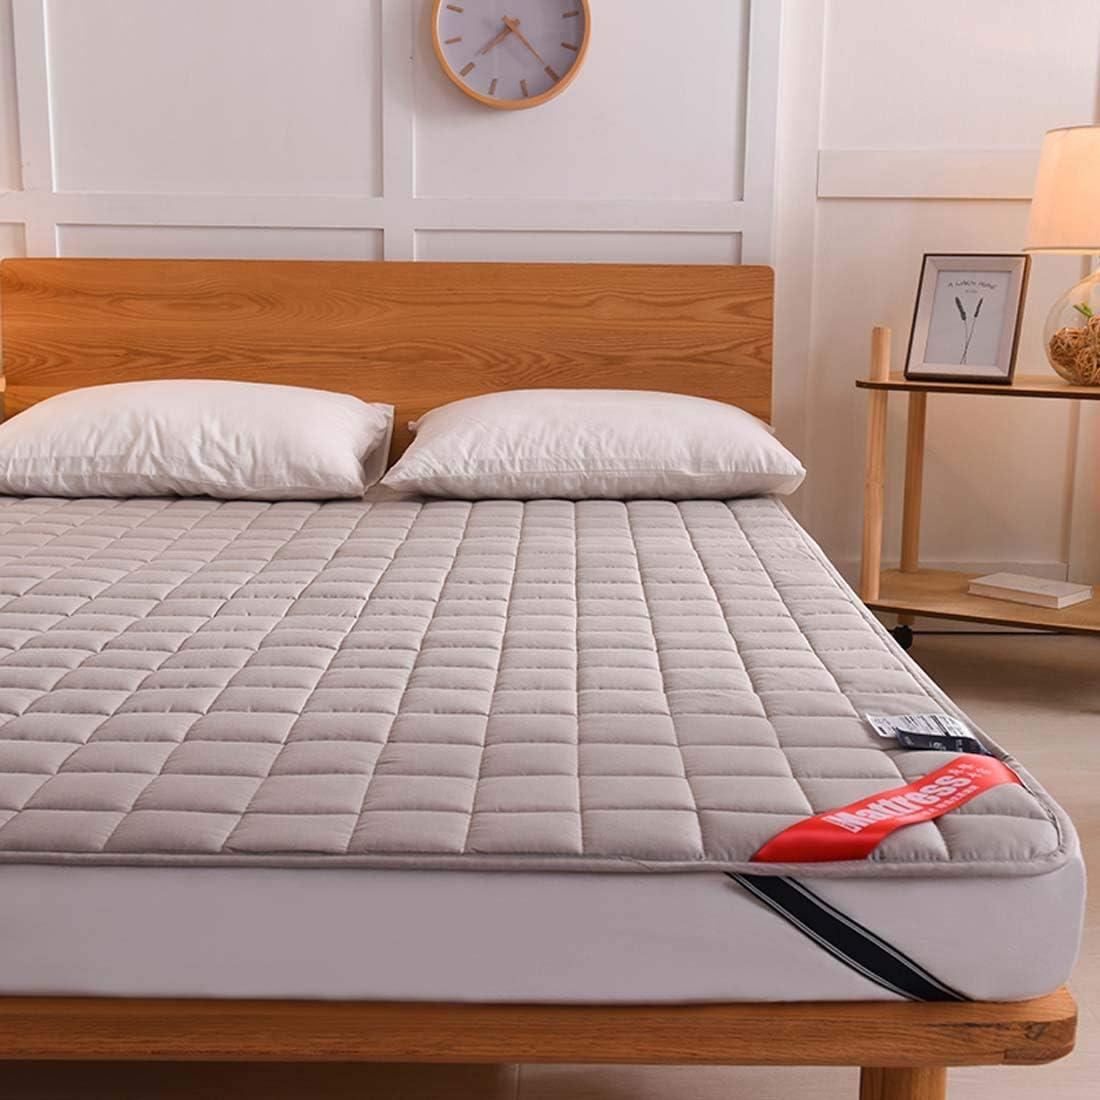 Folding mats 120 200 cm GJP Futon Furniture Traditional Japanese Floor mattresses Meditaion Single Double Size Yoga Beige